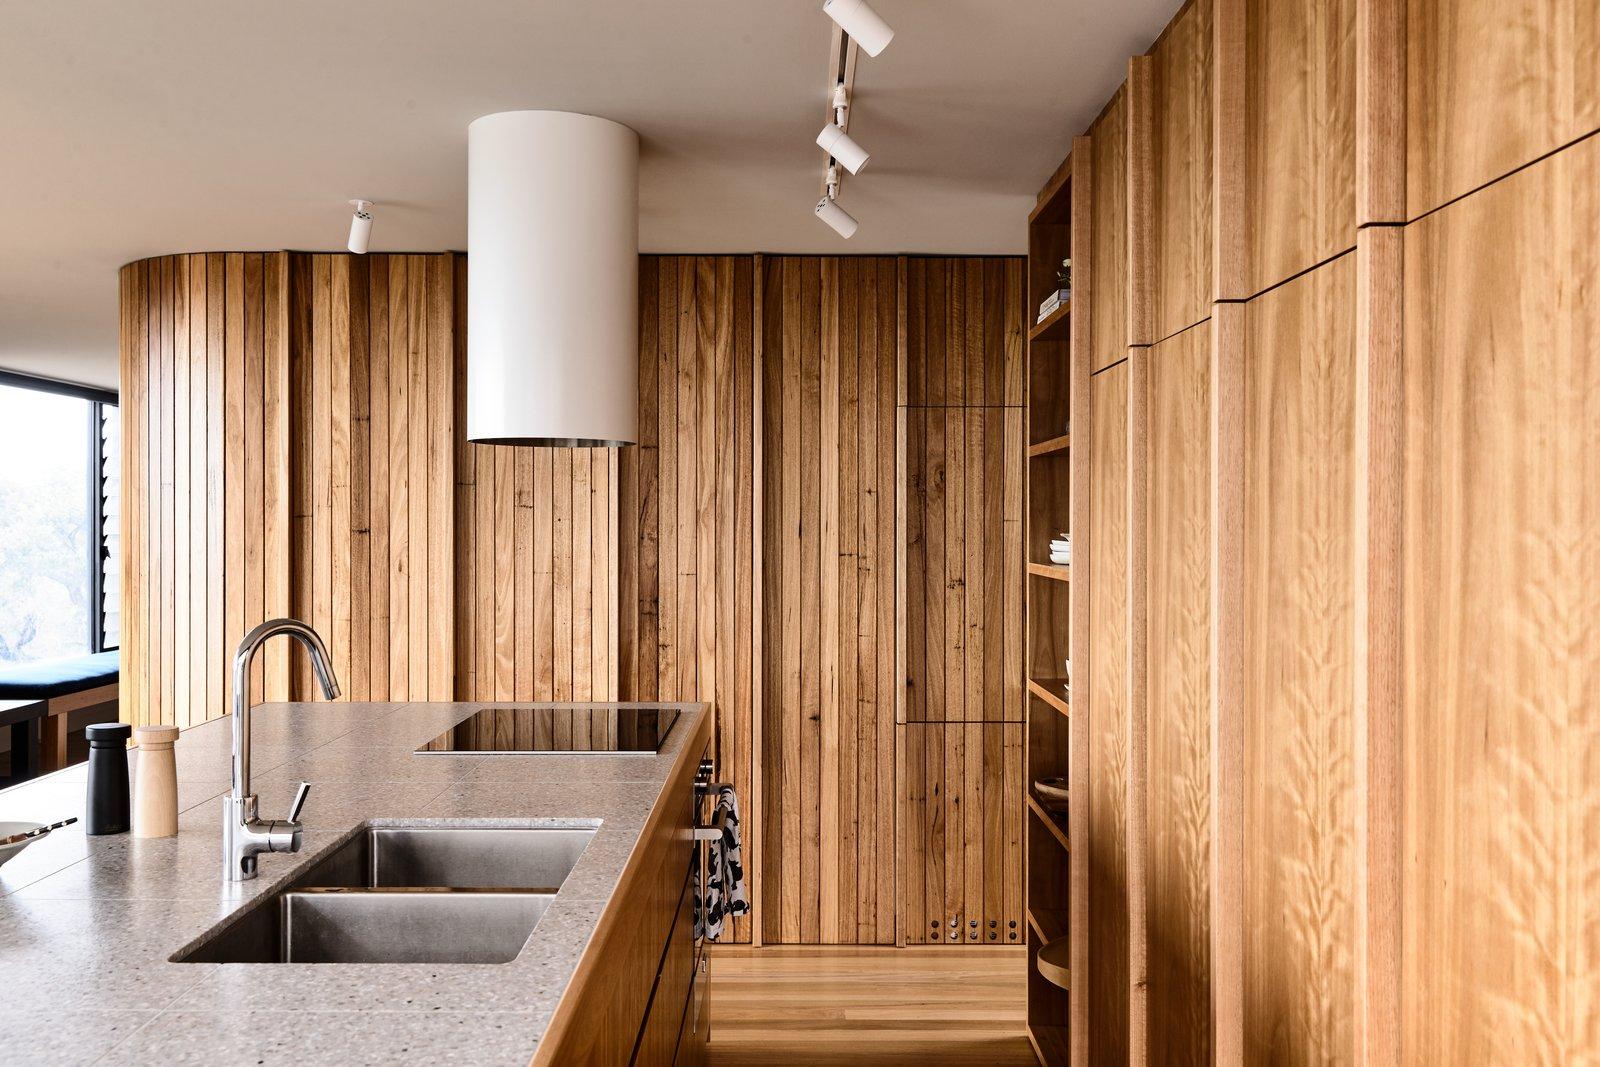 Sorrento House Figureground Architecture Kitchen